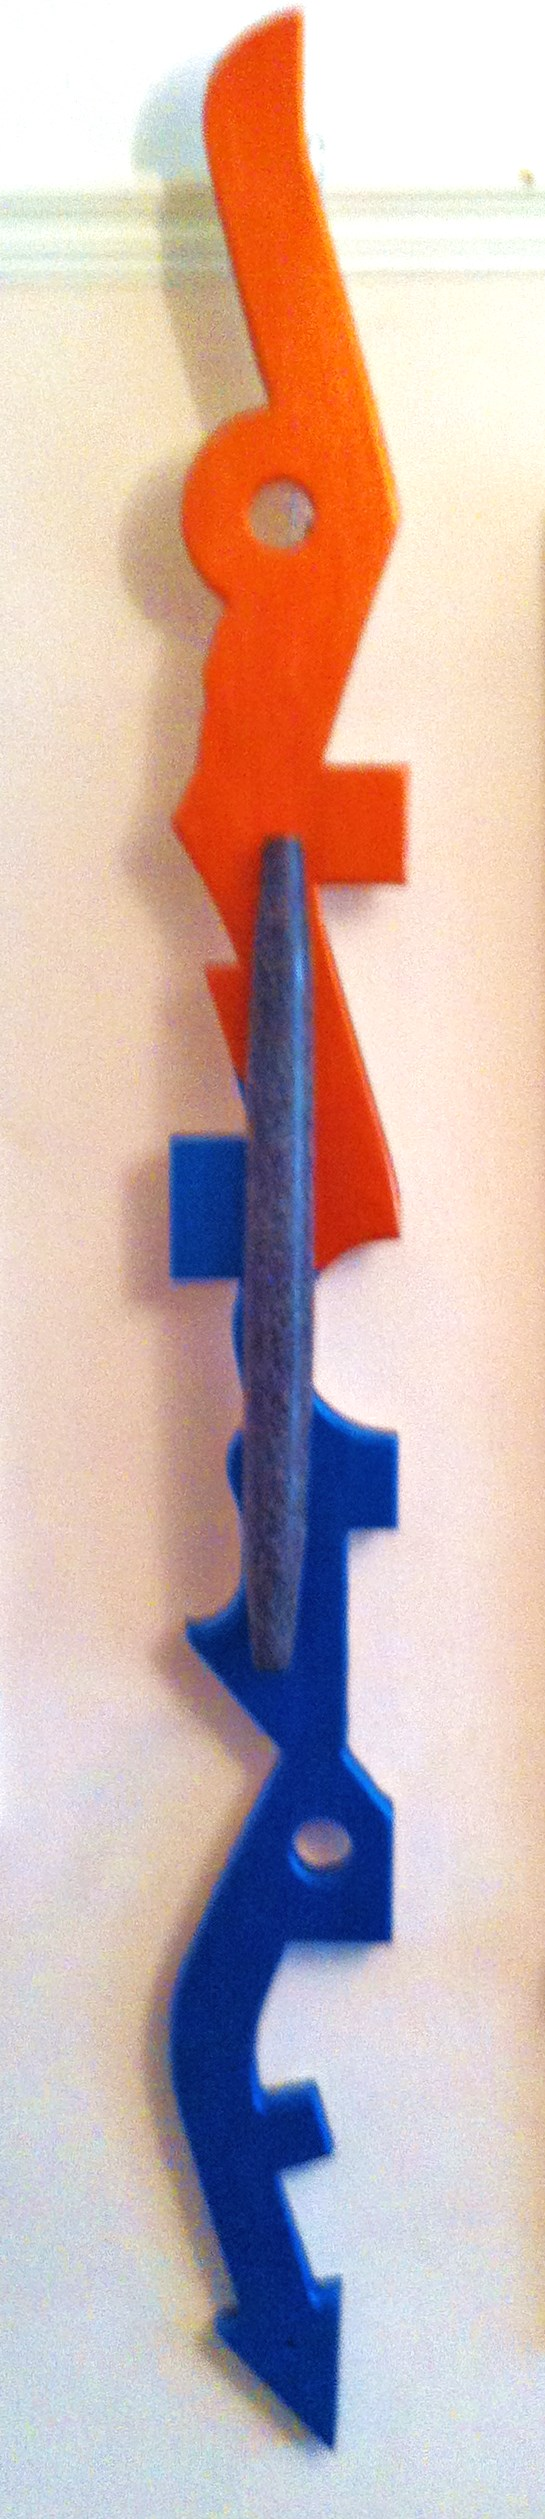 Metal 3 - '..like granite on a stick'